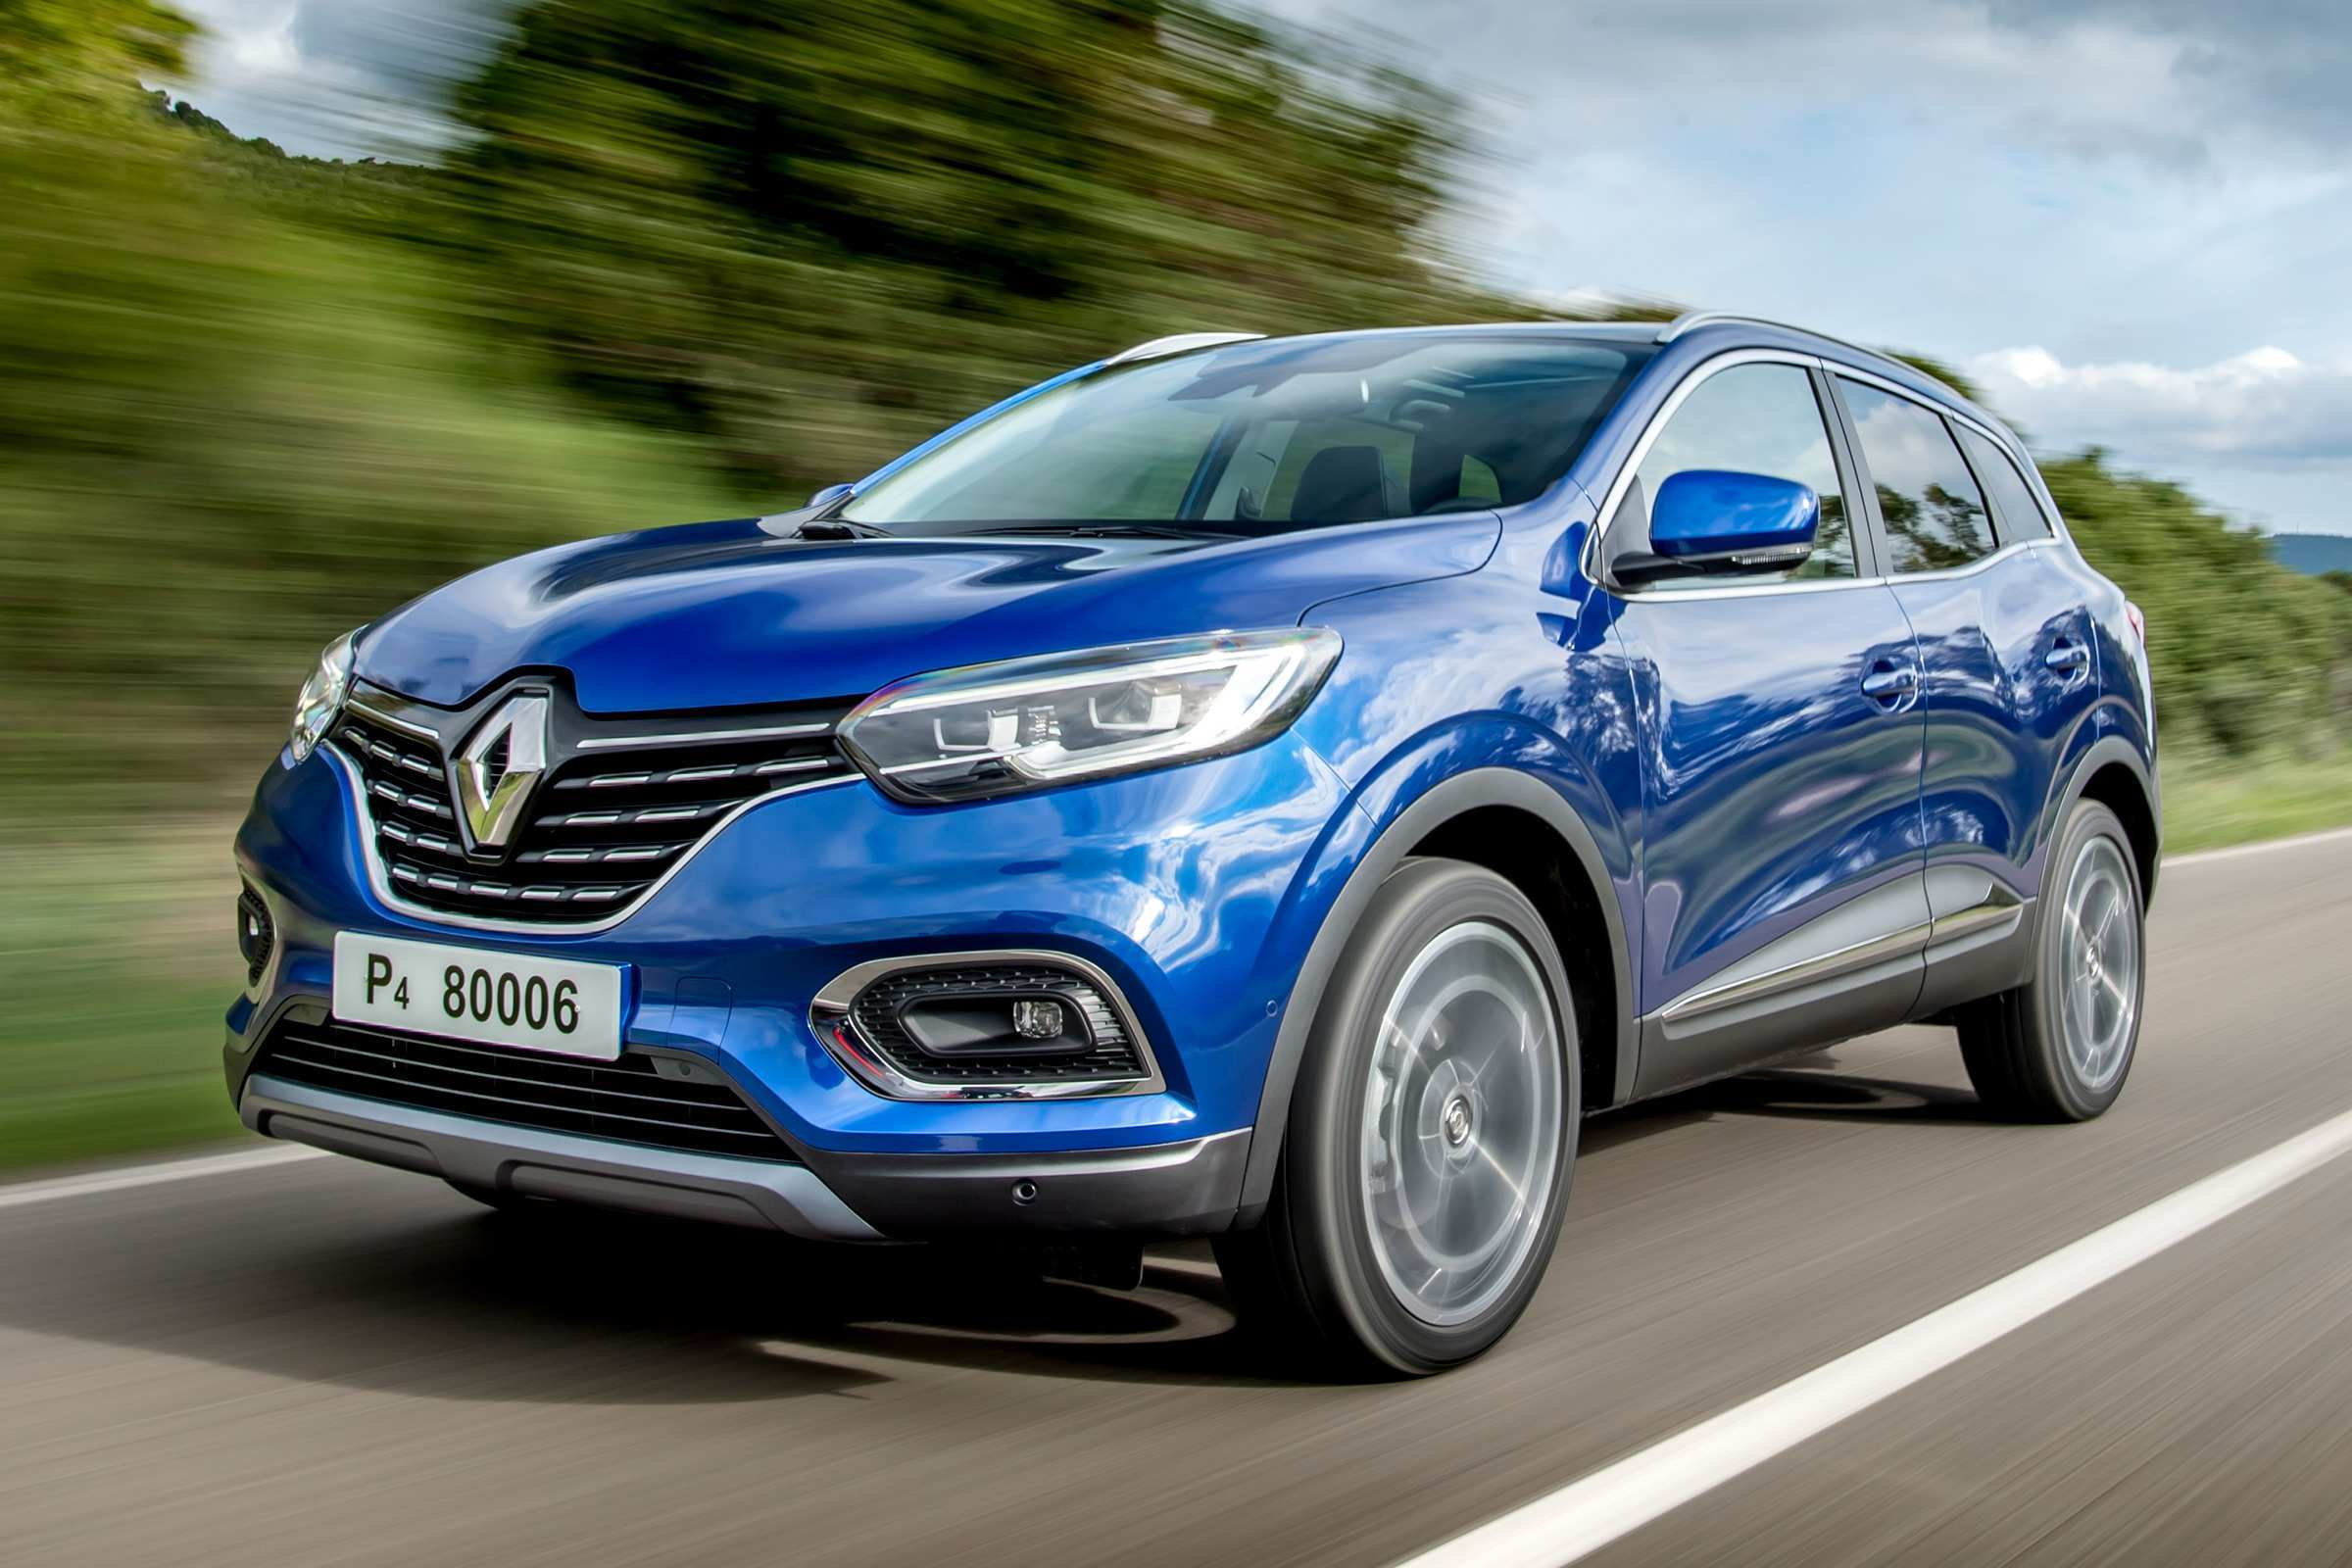 72 All New 2019 Renault Kadjar Review by 2019 Renault Kadjar